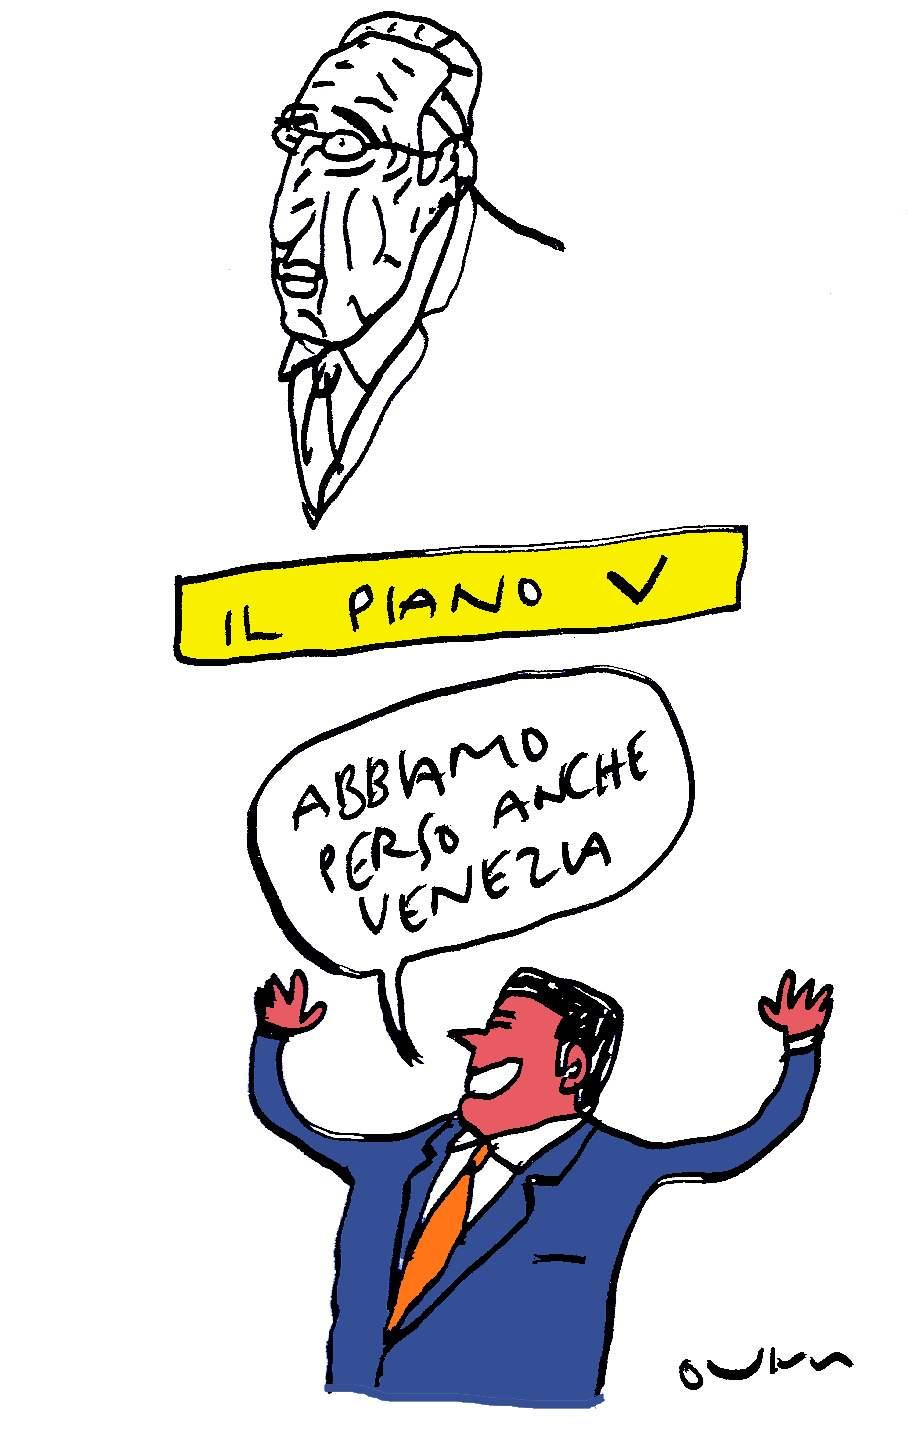 piano vk